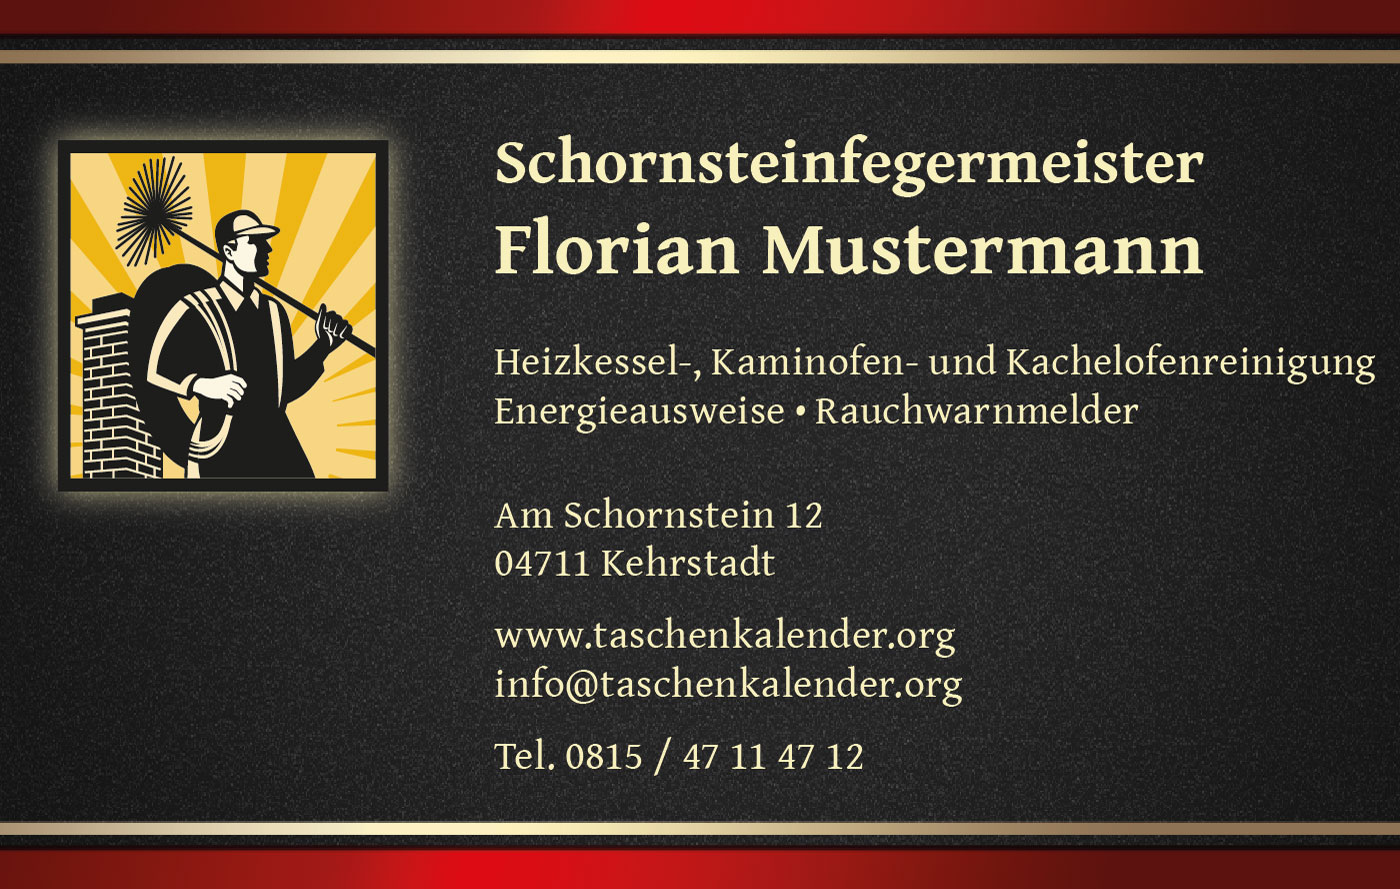 Schornsteinfeger Visitenkarten Design Gestaltung